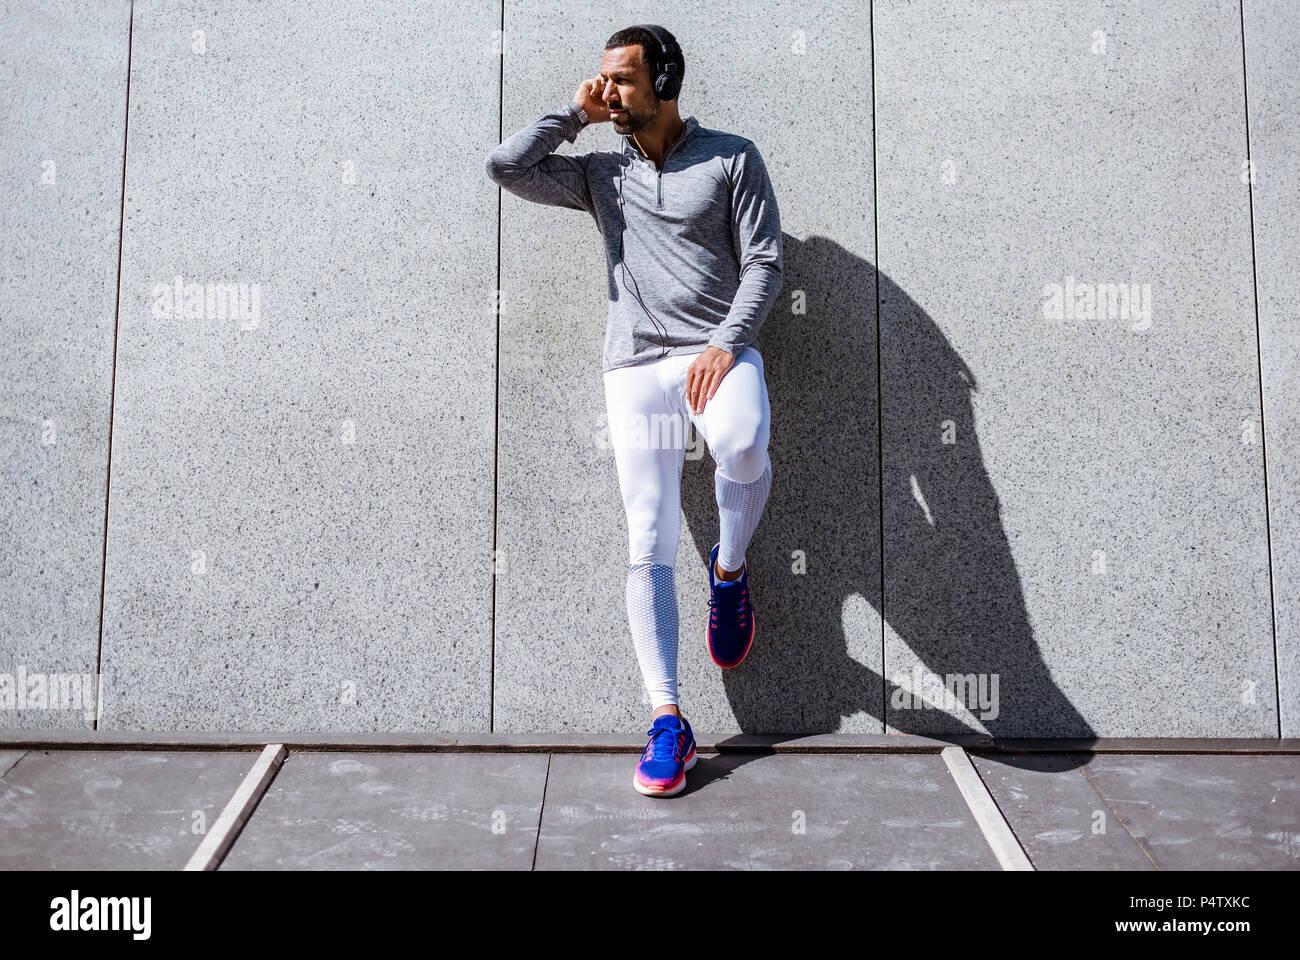 Man having a break from exercising wearing headphones - Stock Image